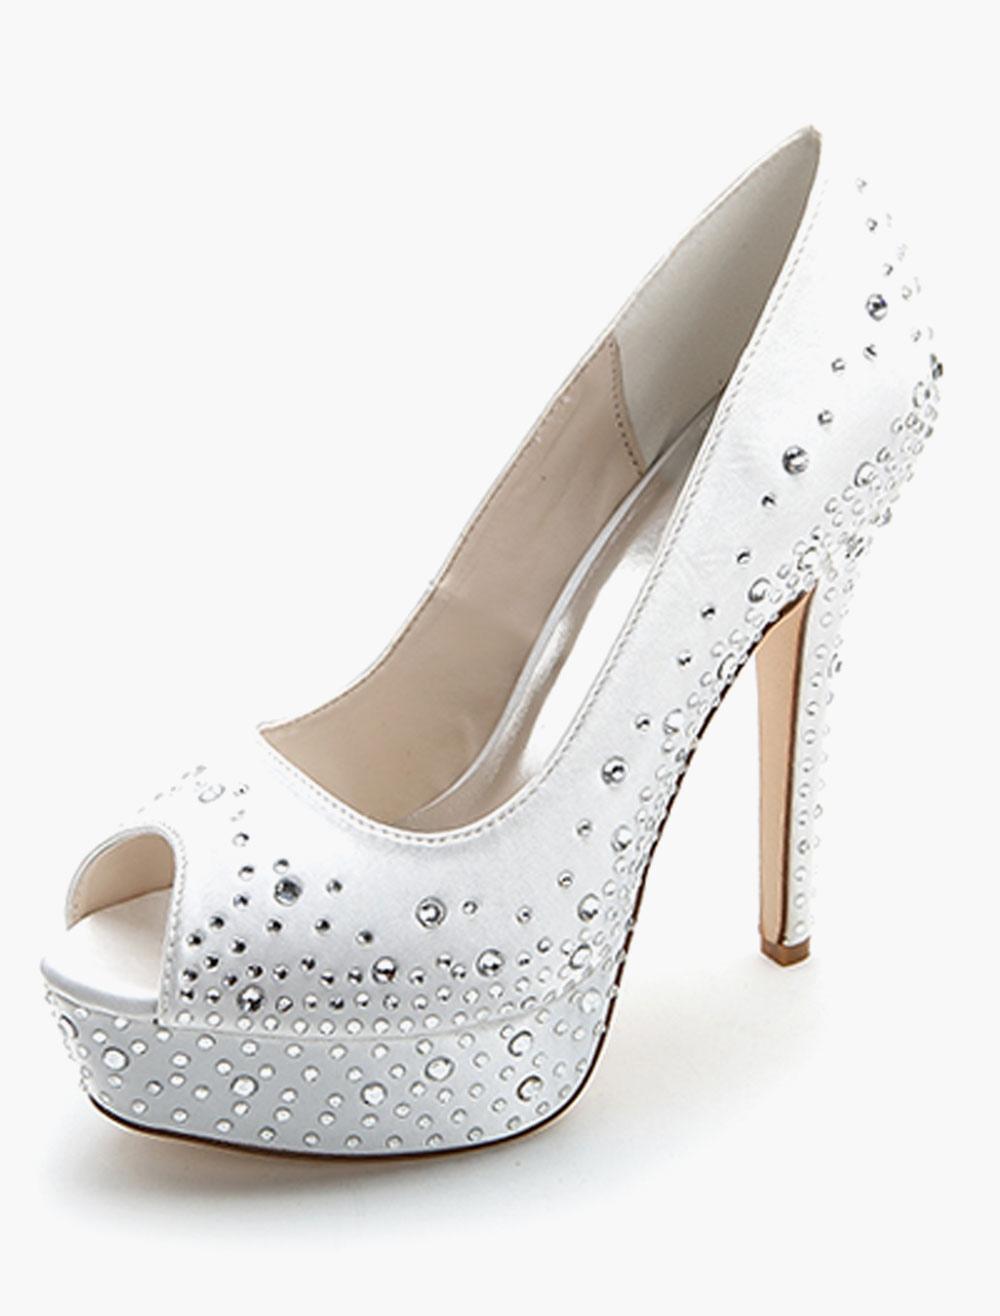 White Peep Toe Satin Evening and Bridal Sandals with Rhinestones